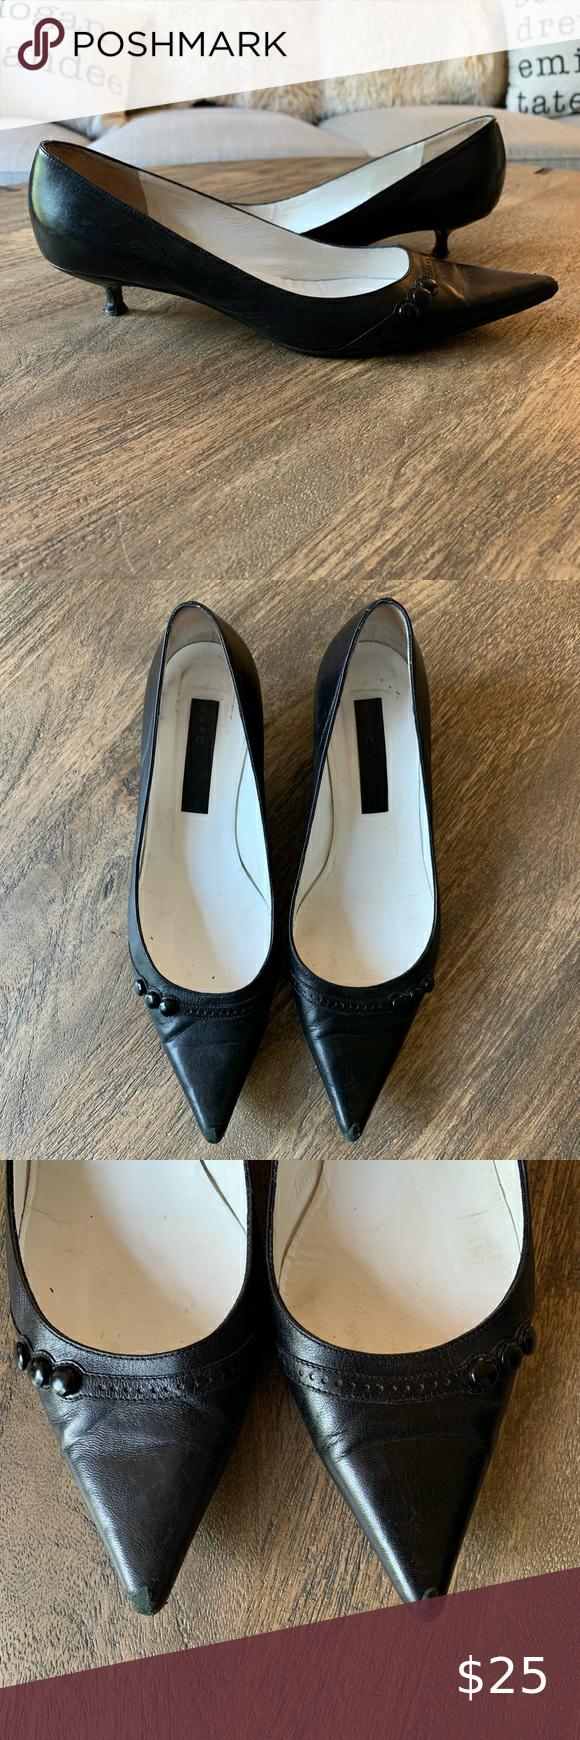 Marc Jacobs Pointed Toe Kitten Heel Black Sz 9 5 In 2020 Kitten Heels Black Heels Marc Jacobs Shoes